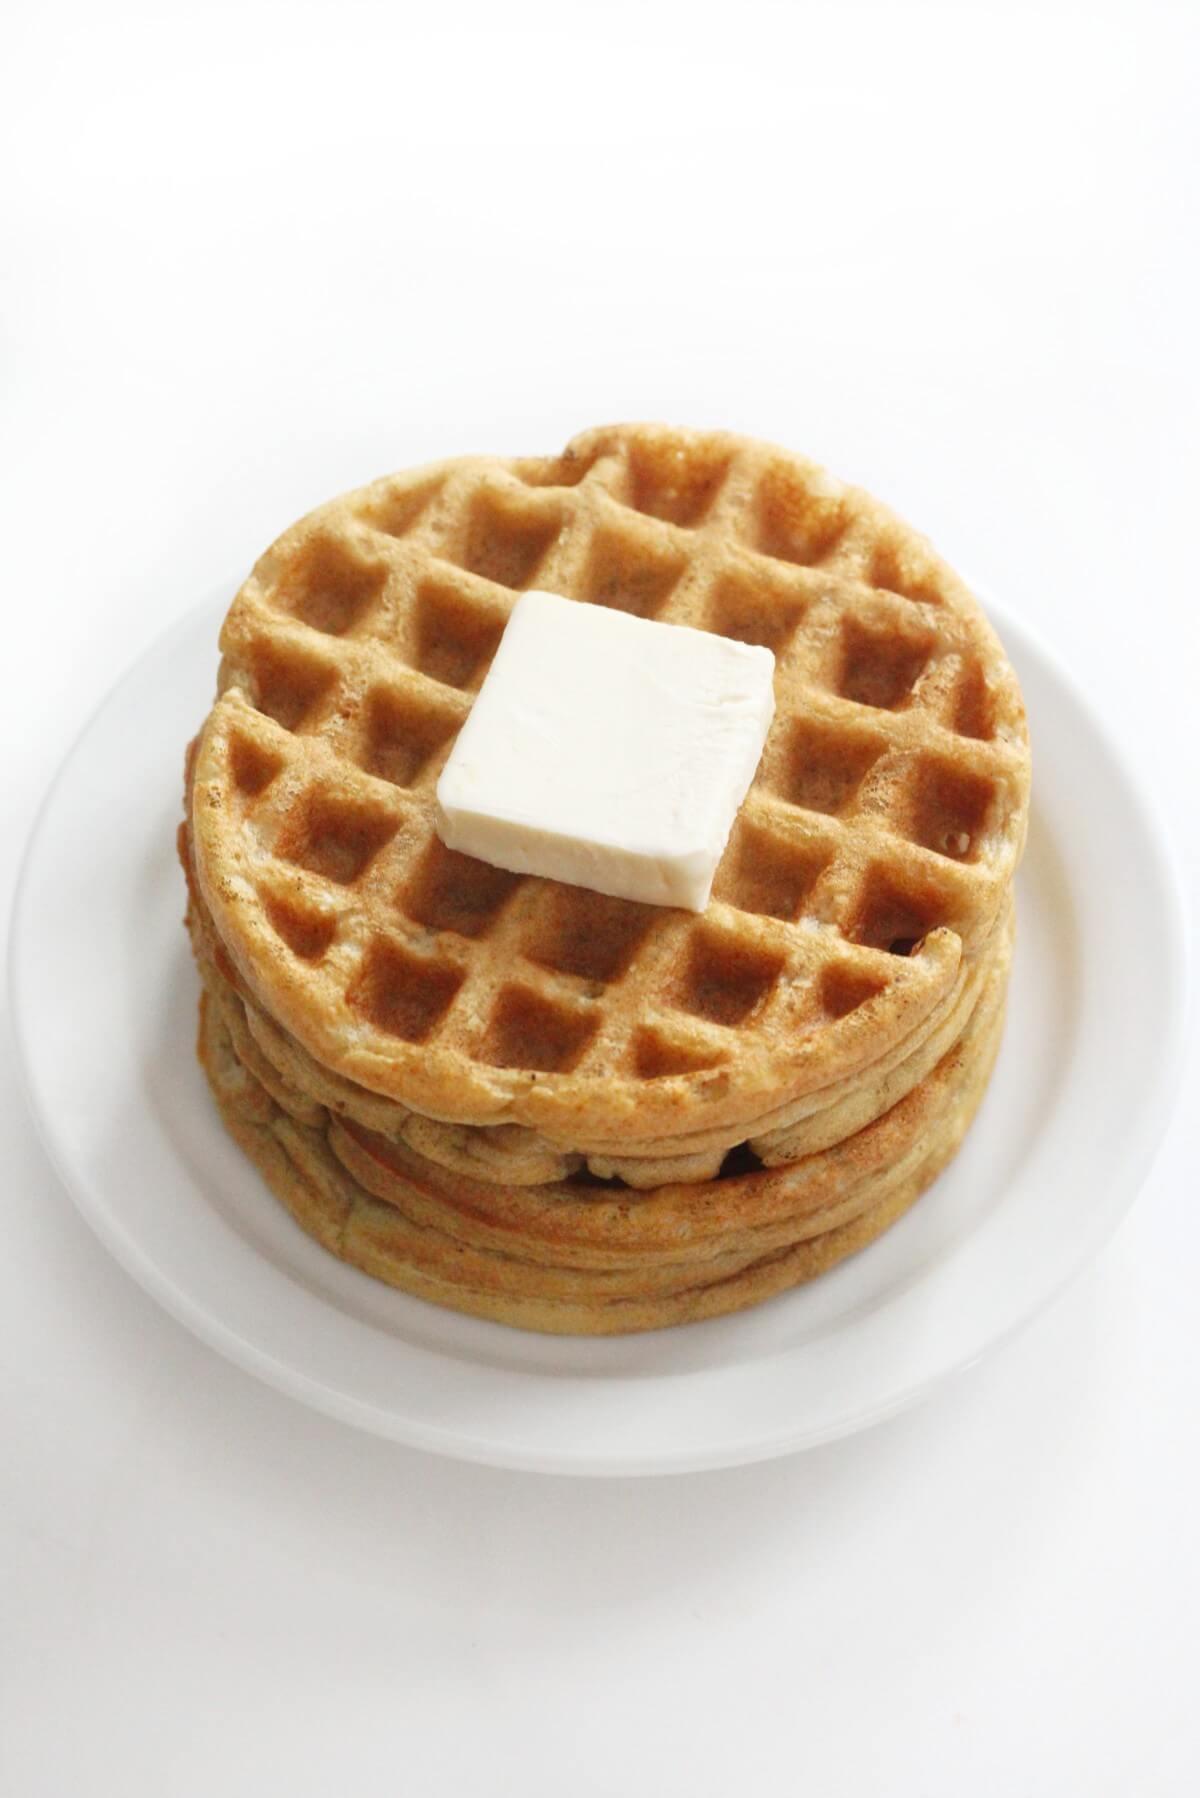 plain stack of gluten-free vegan buttermilk waffles